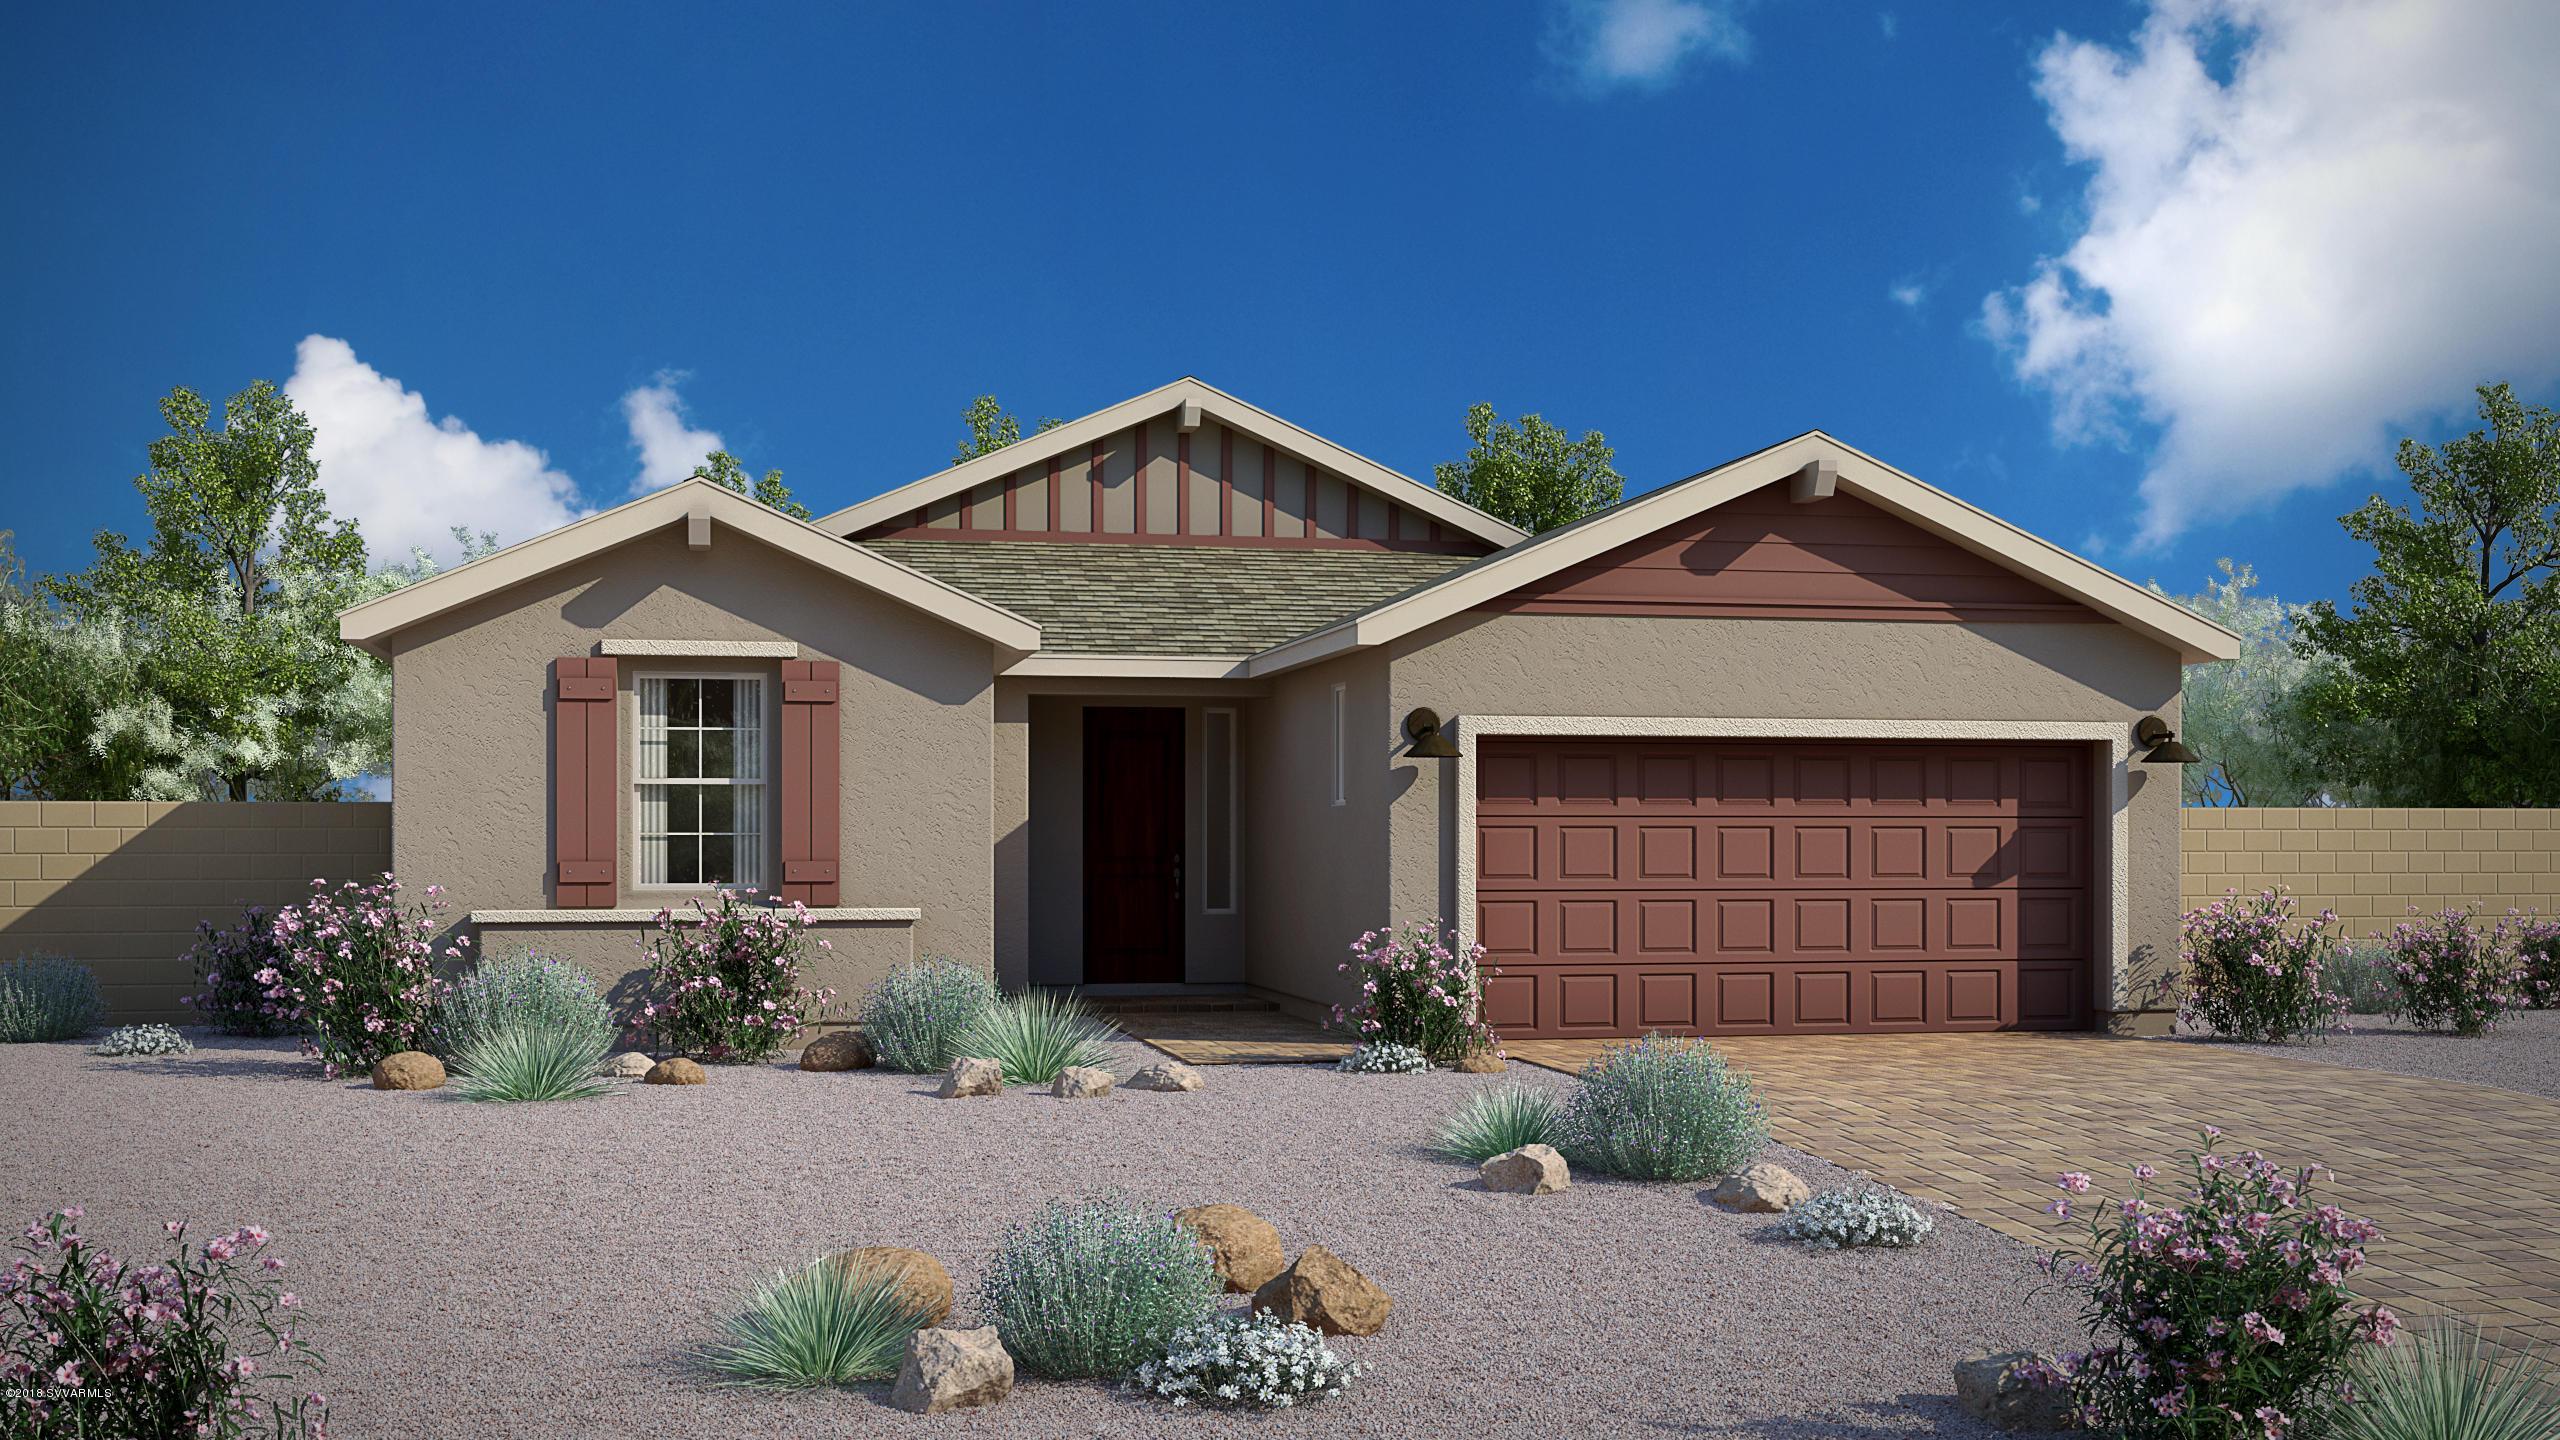 478 Miner's Gulch Drive Clarkdale, AZ 86324